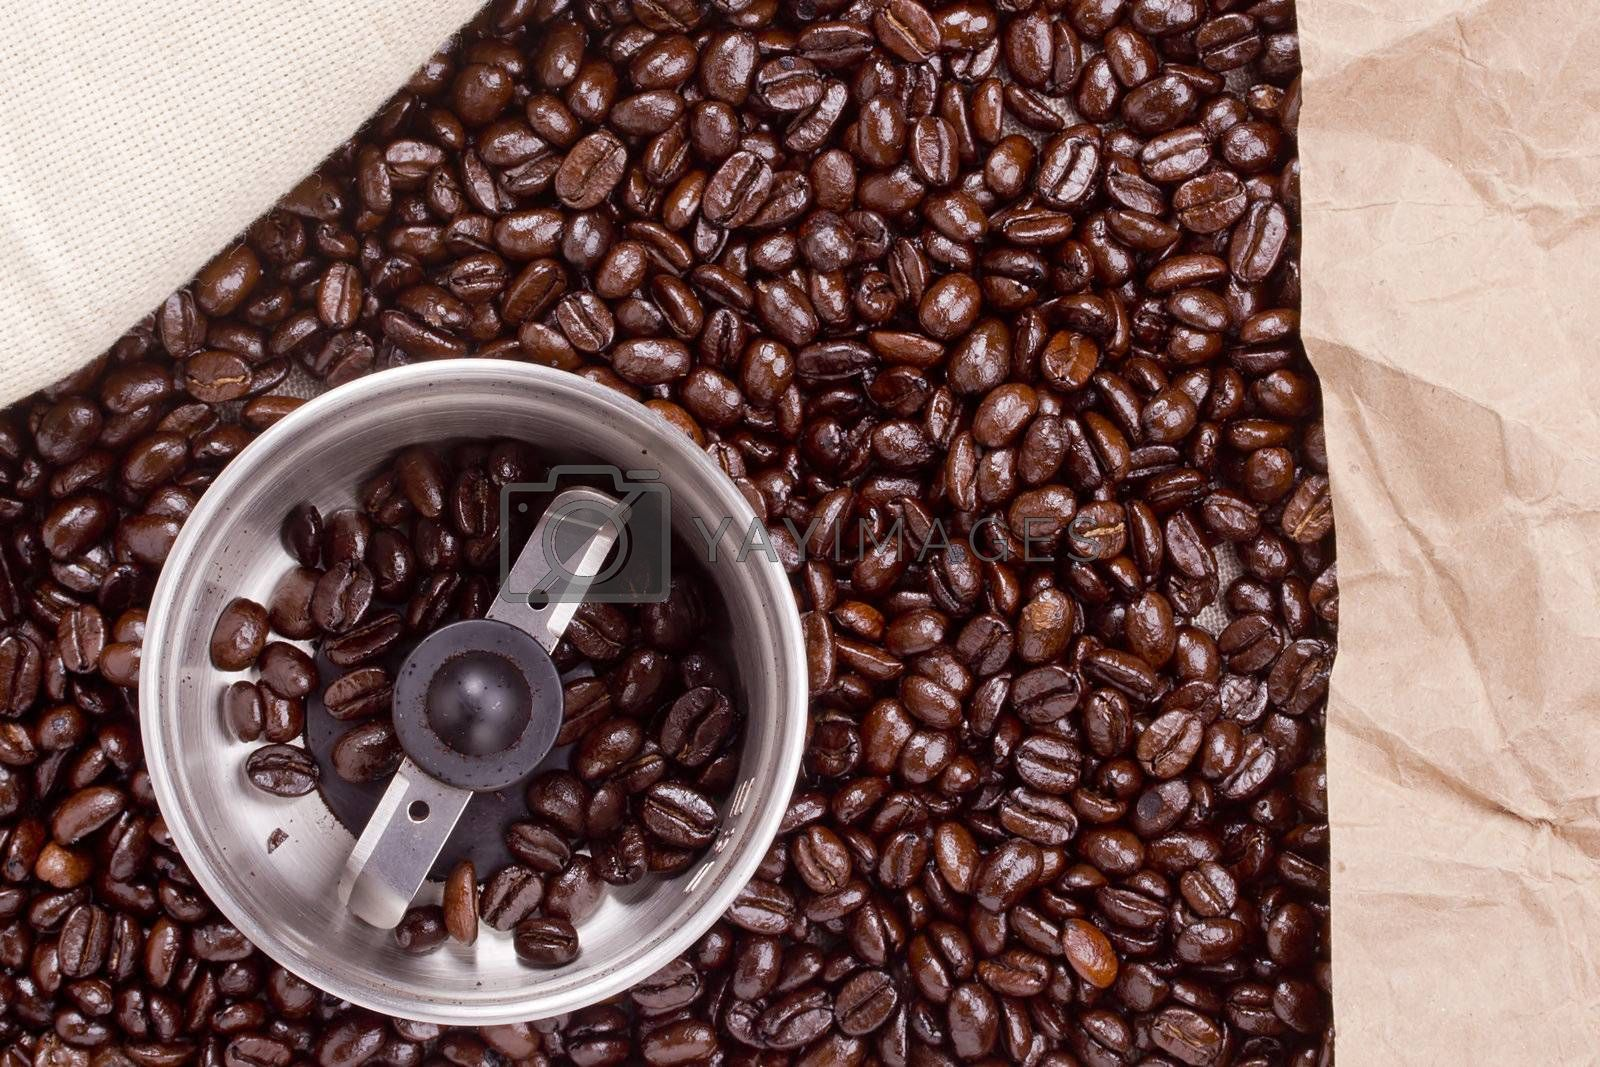 Coffee beans by VIPDesignUSA